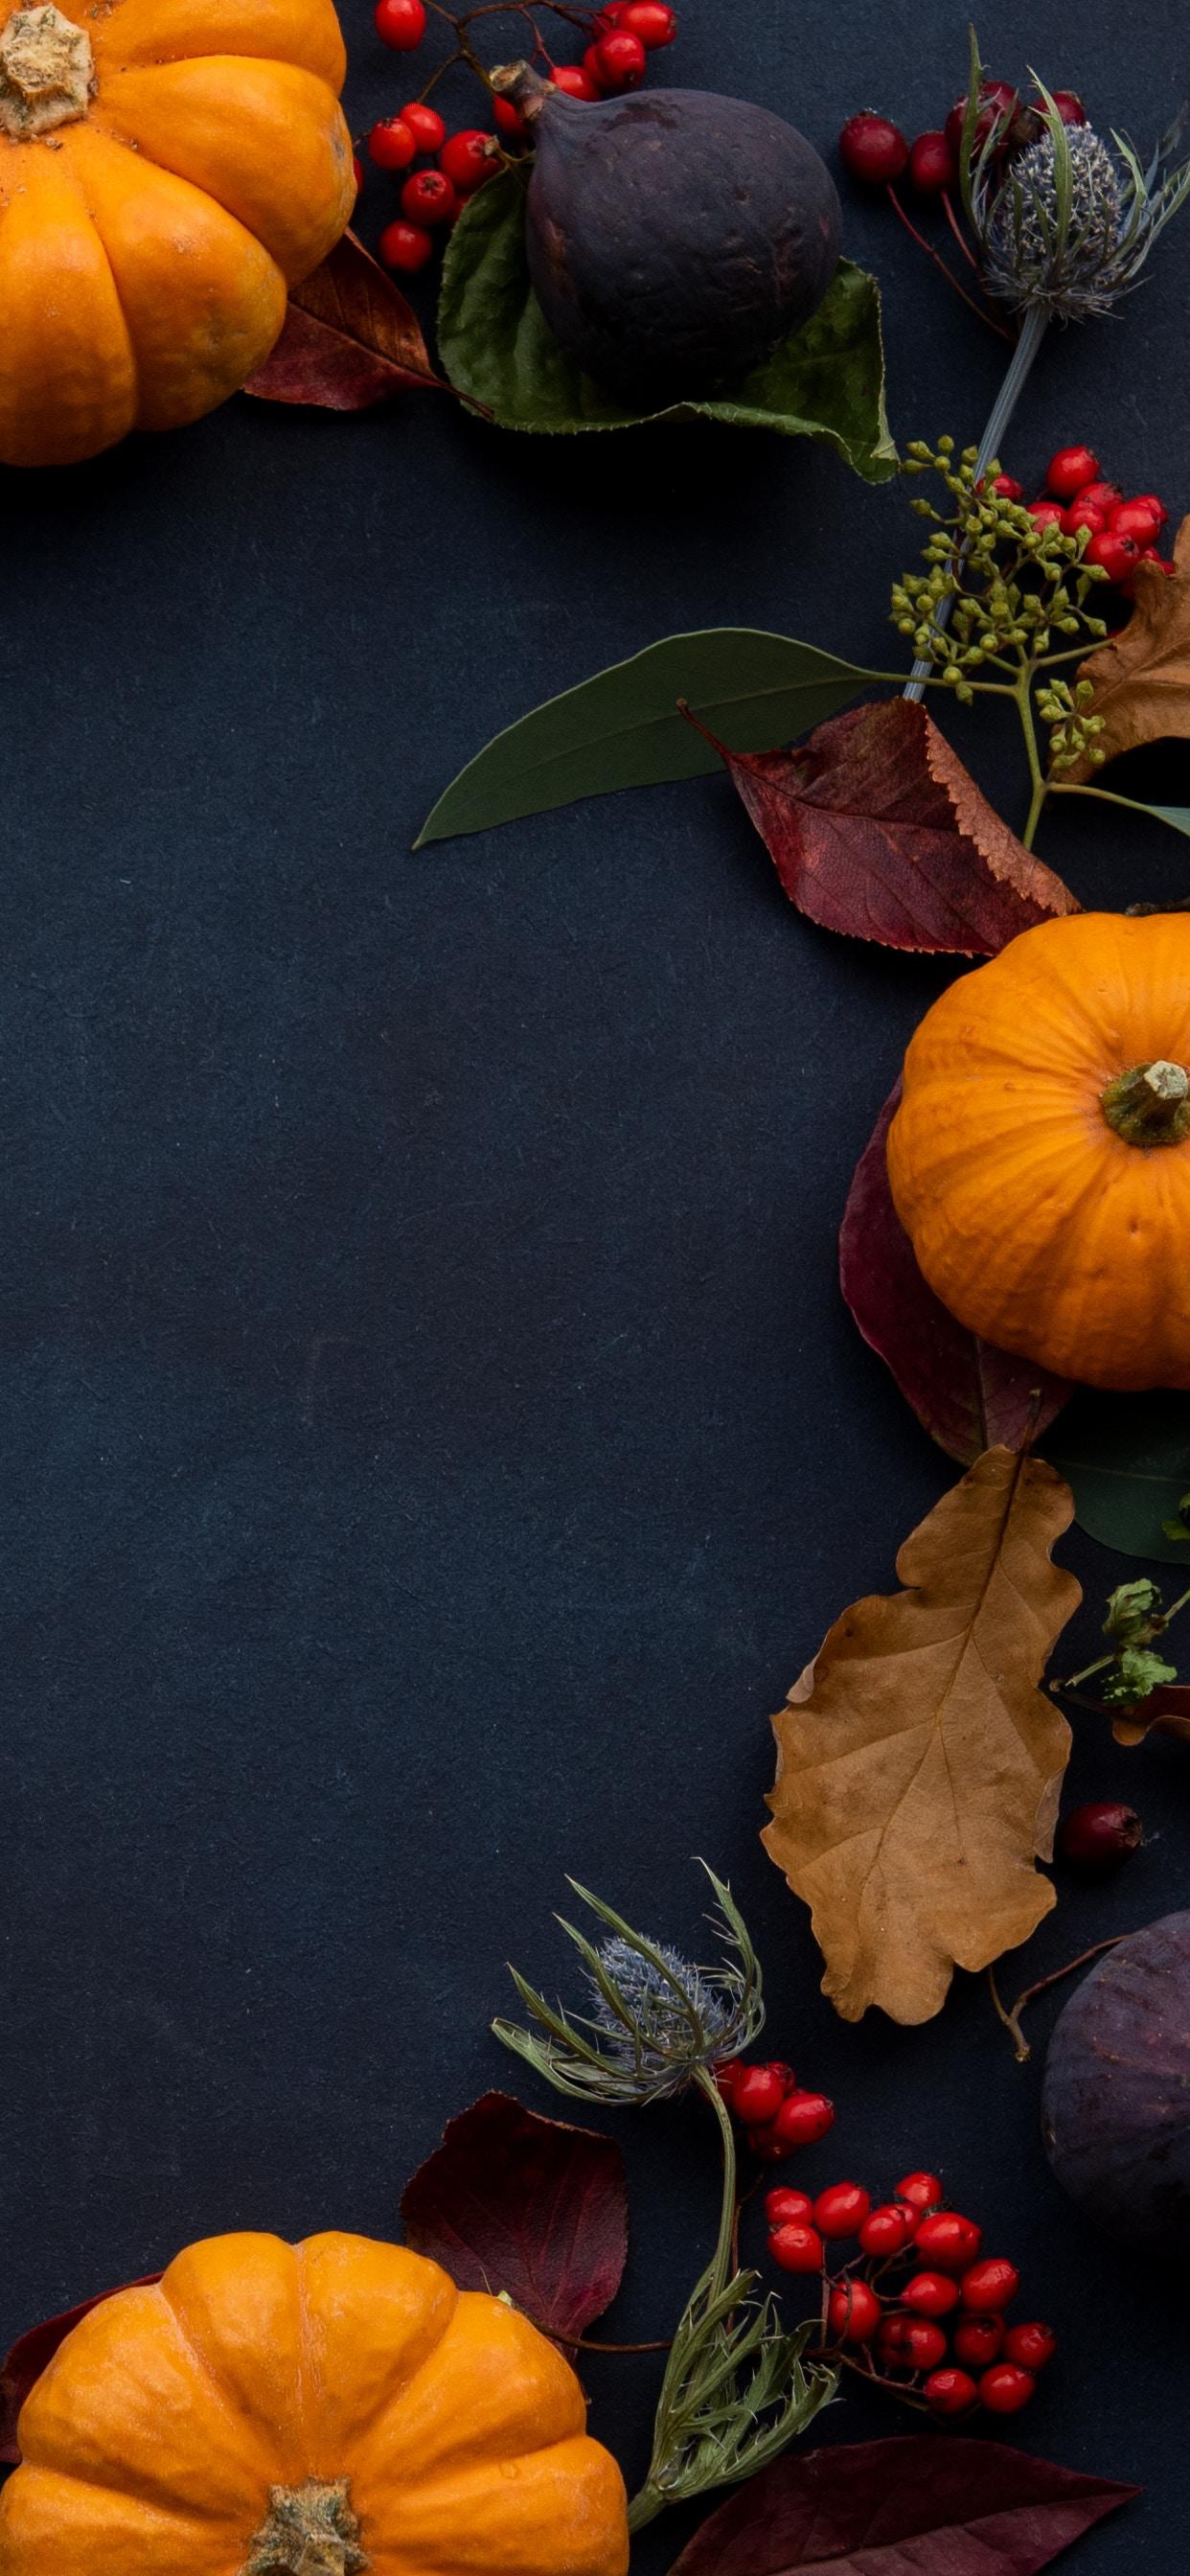 Orange Pumpkin Wreath Fall Iphone X Xs Max Autumn Wallpaper